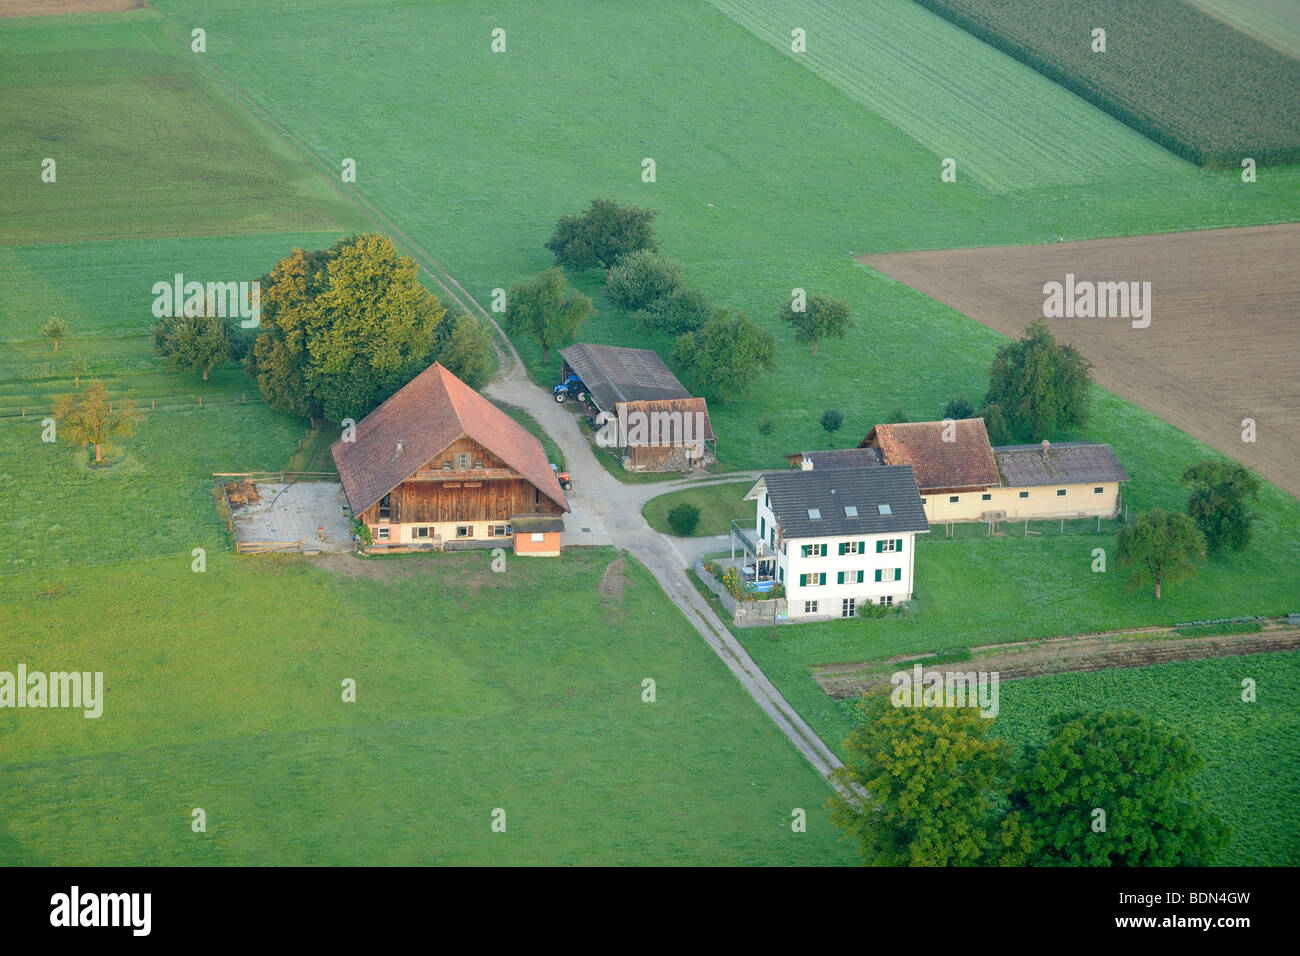 Une ferme typiquement suisse de dessus, Luzern, Suisse, Europe Photo Stock